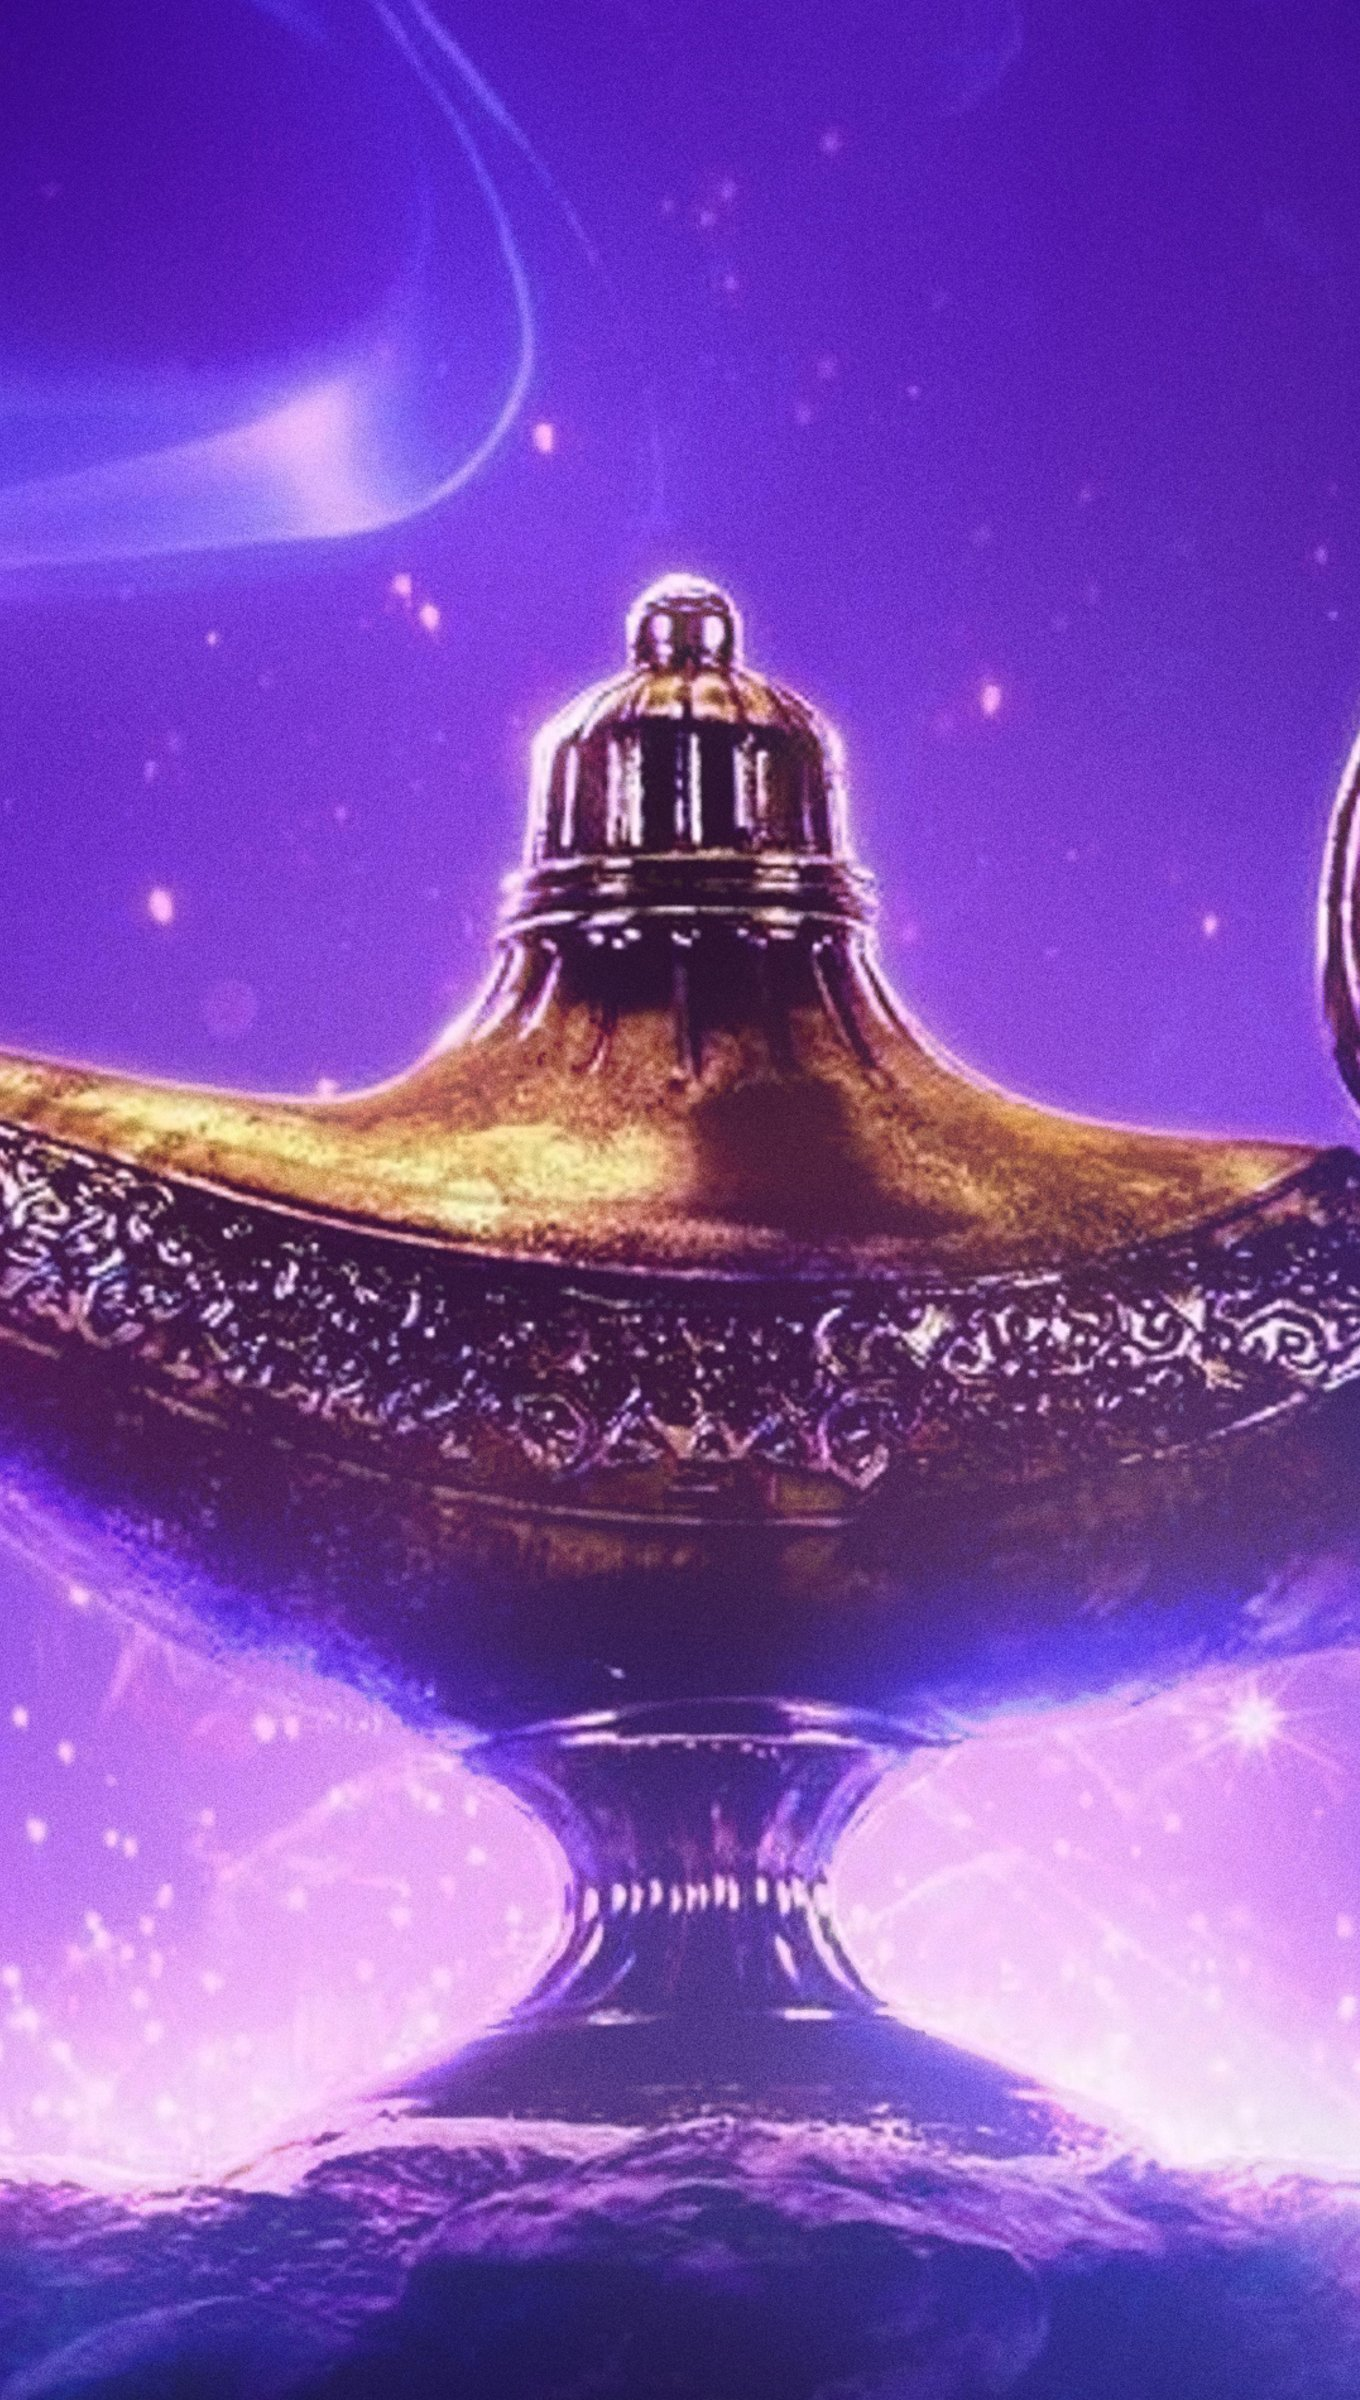 Fondos de pantalla Lampara de Aladin Vertical